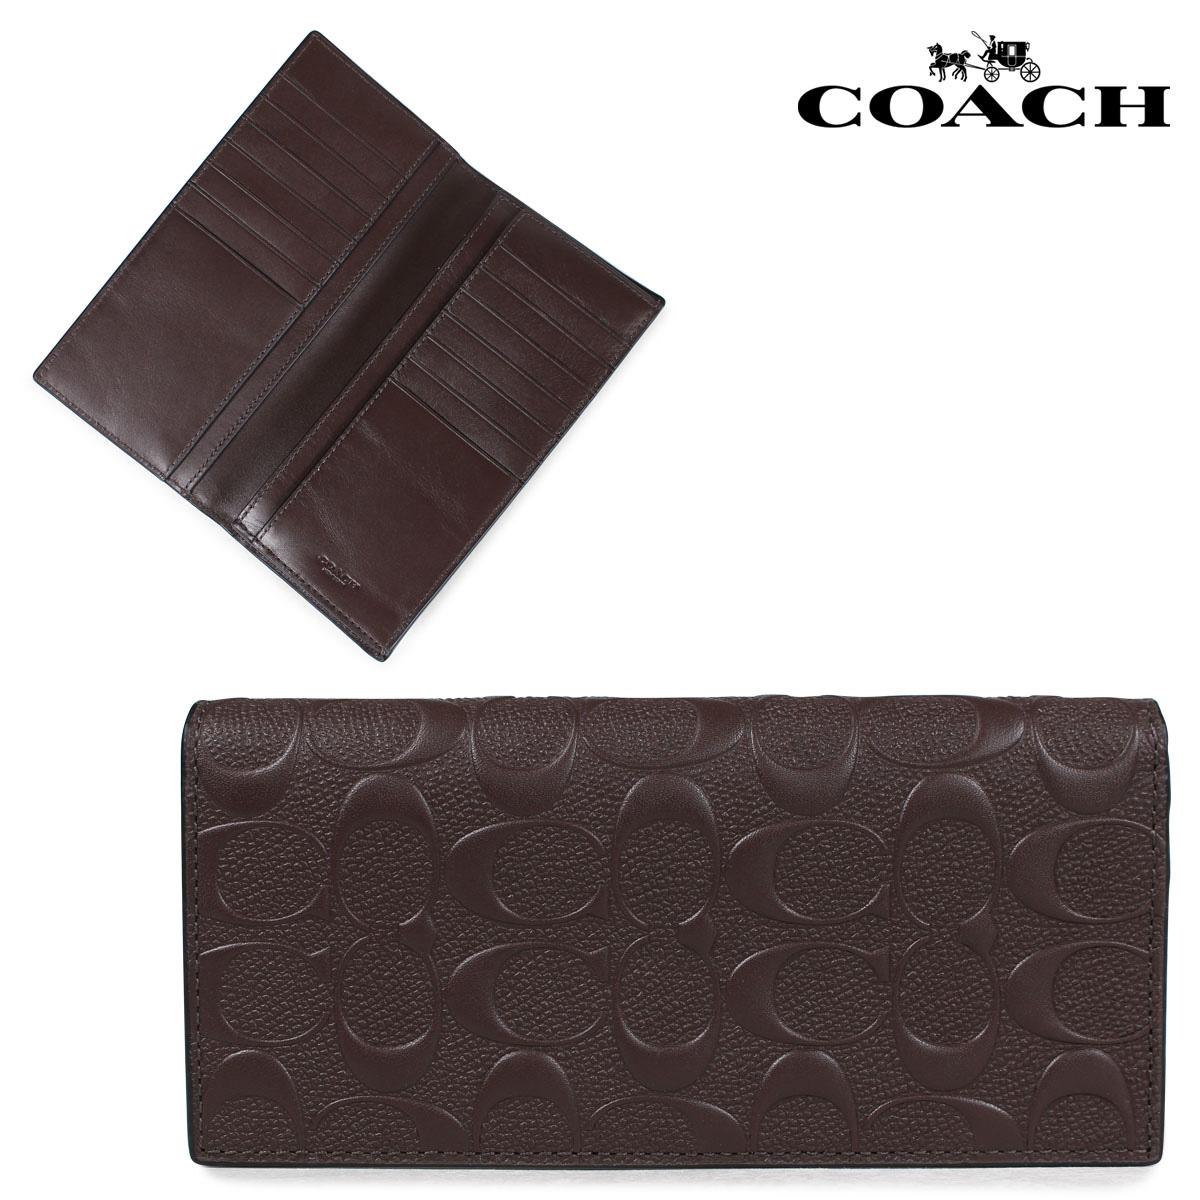 COACH F75365 コーチ 財布 長財布 メンズ レザー シグネチャー ブラウン